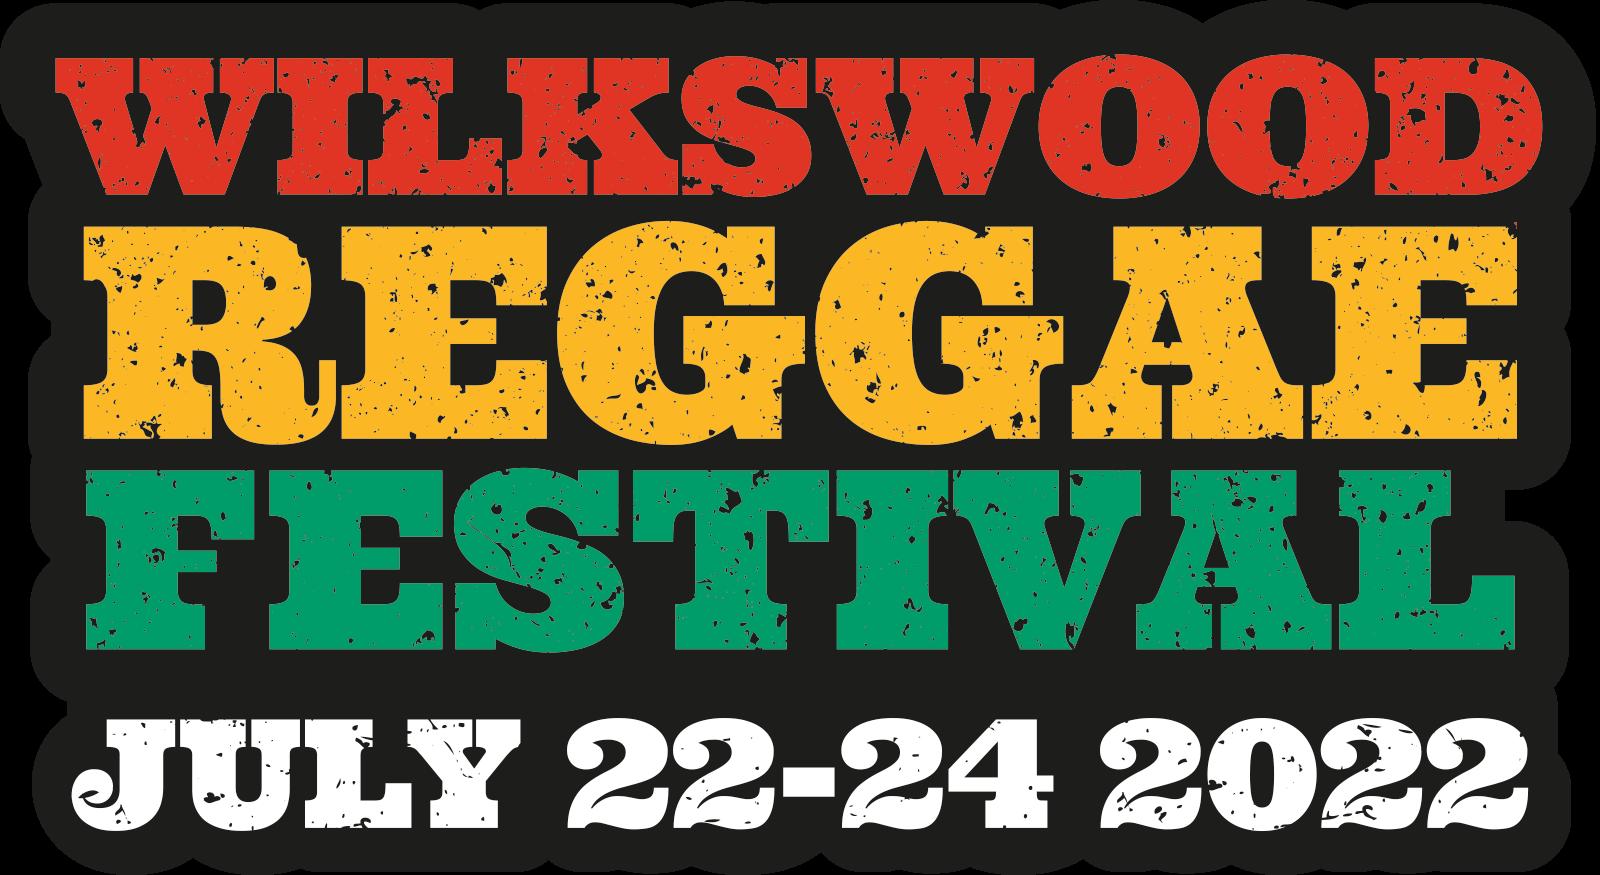 Wilkswood Reggae Festival 22nd - 24th July 2022